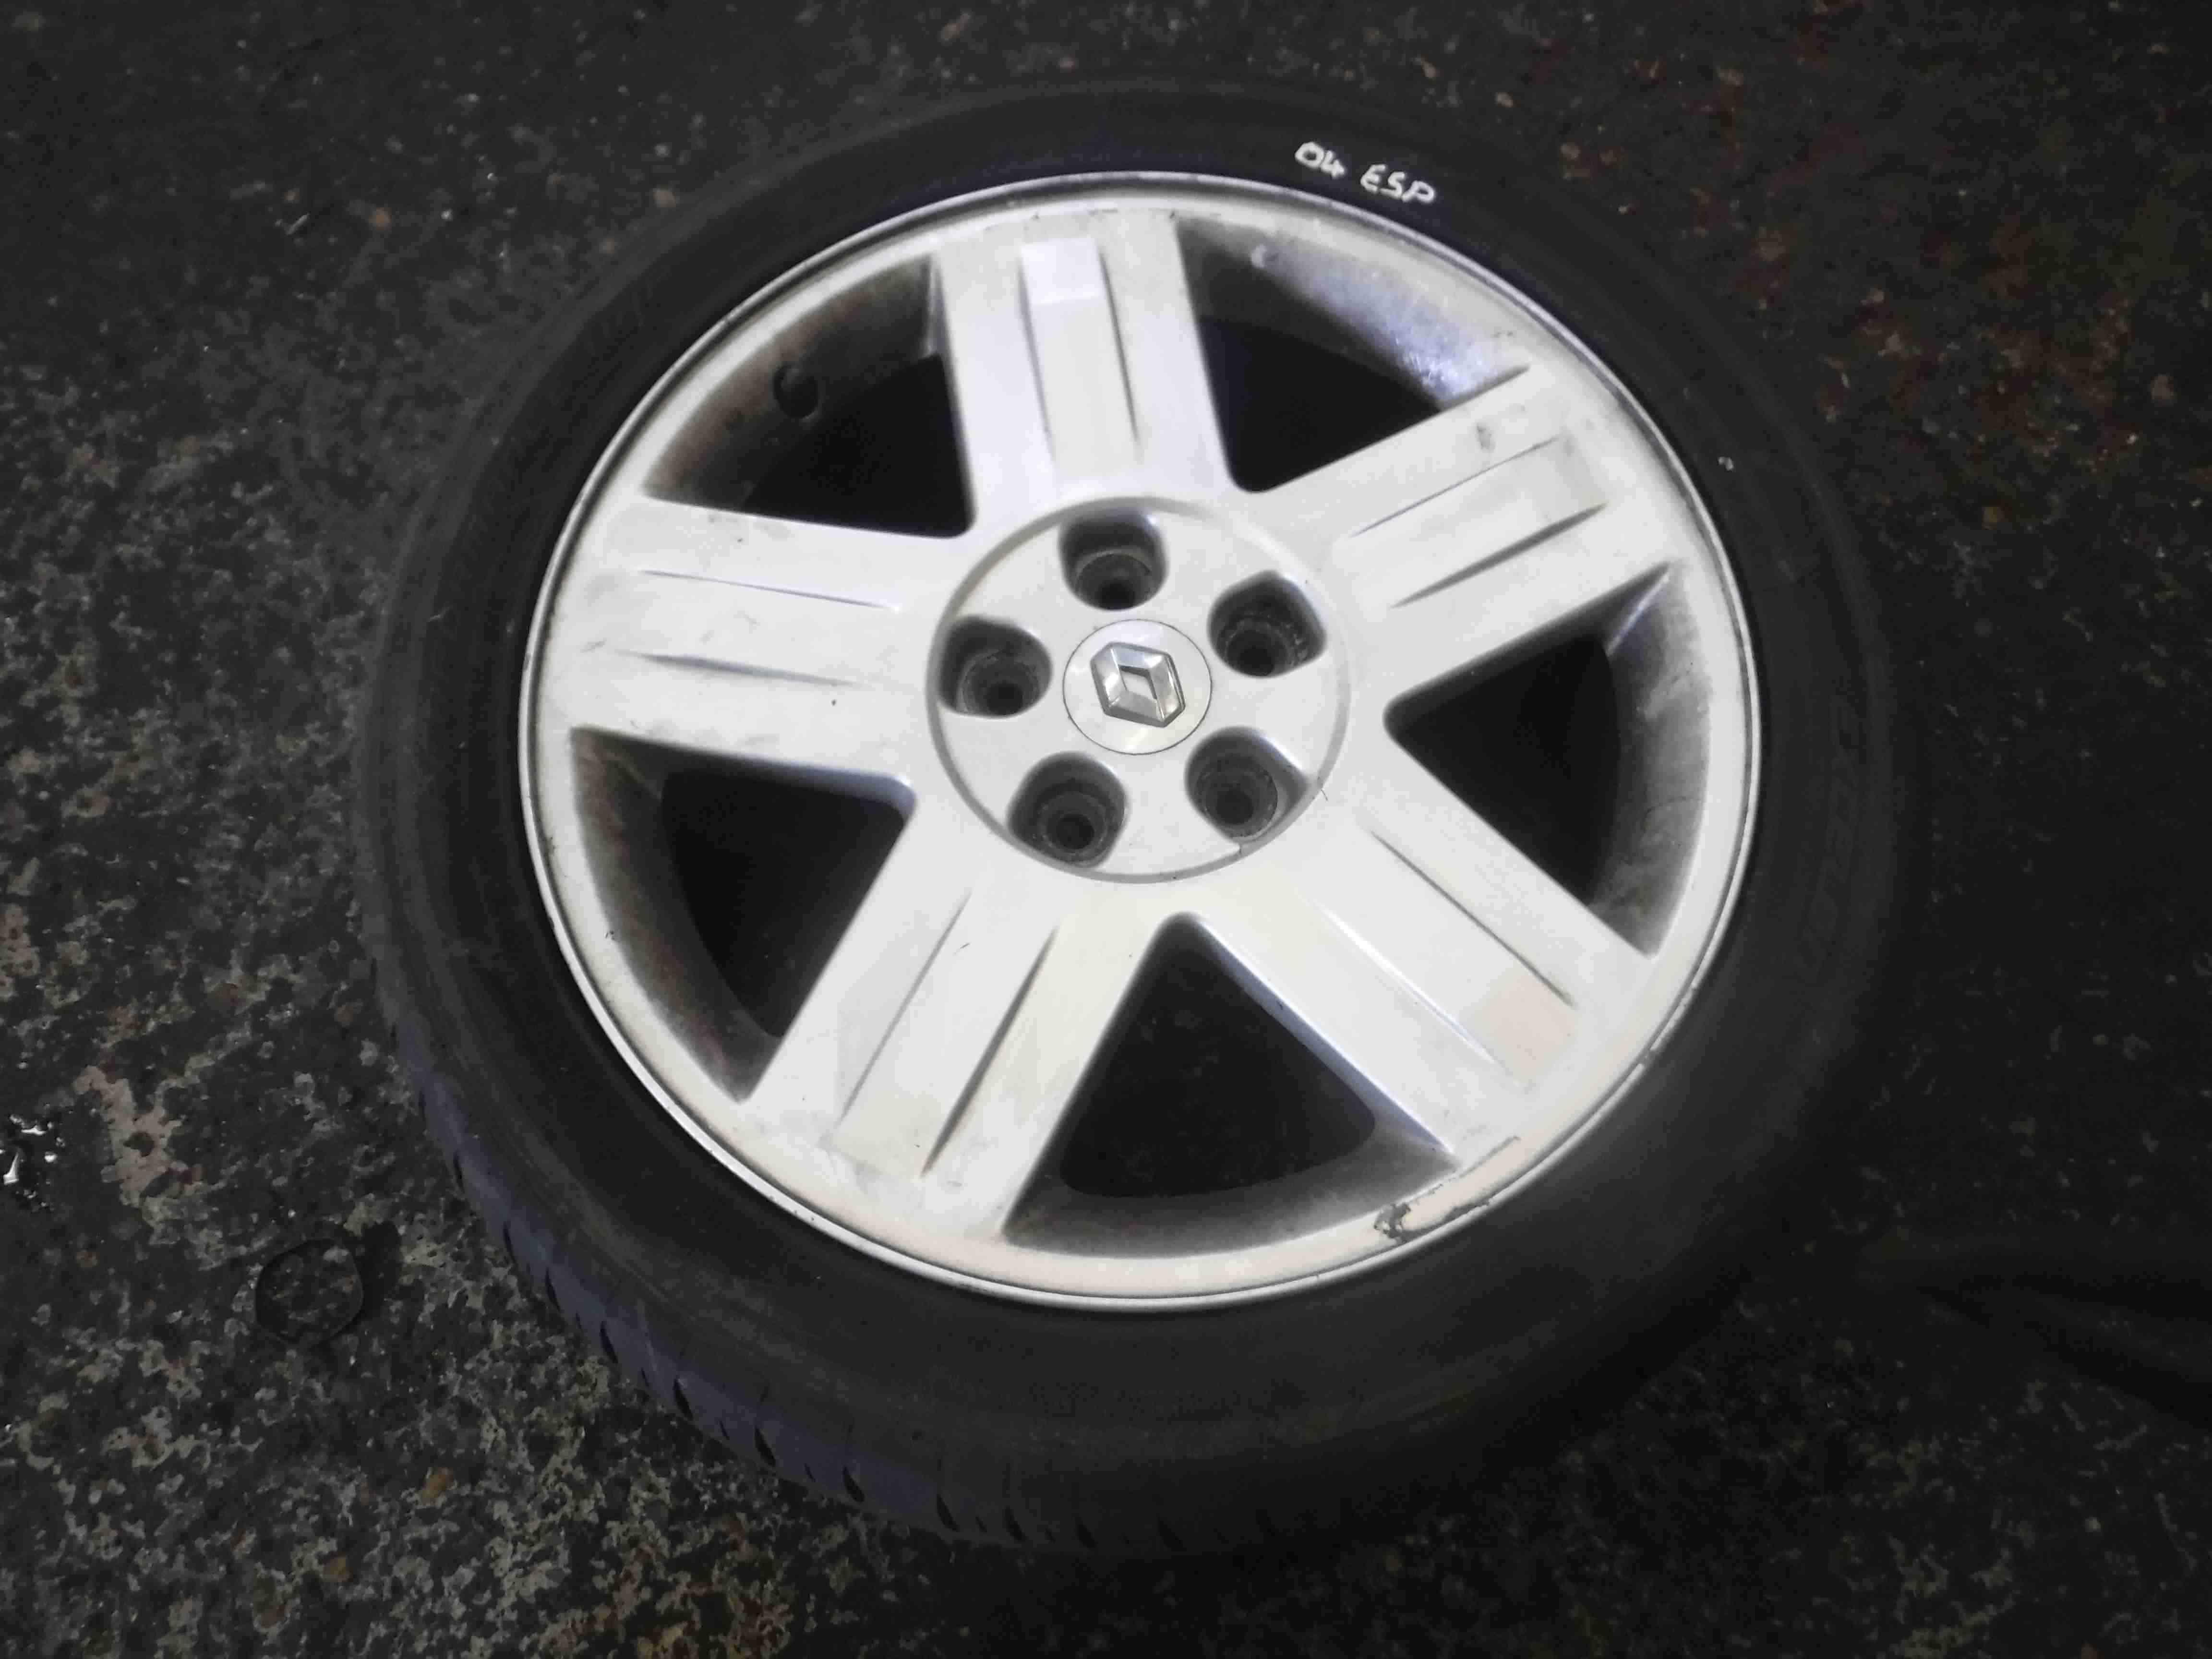 Renault Espace 2003-2013 Antares Alloy Wheel + Tyre 225 45 17 4mm 4/5